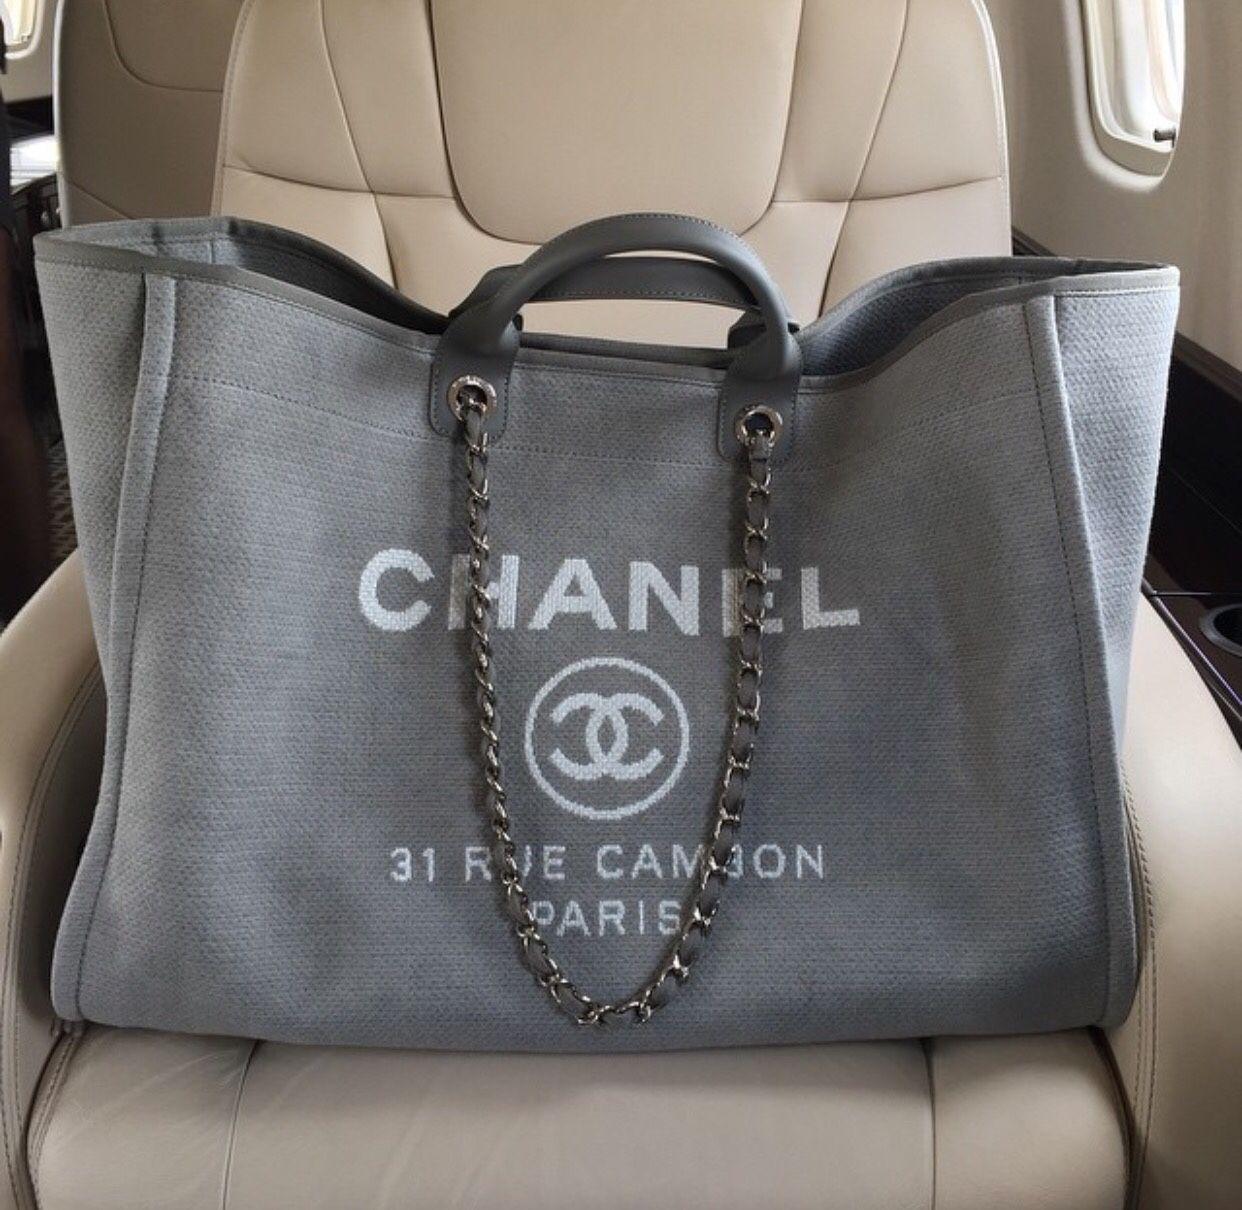 Chanel bag☻♥   Purses   Pinterest   Bags, Chanel and Handbags f51eda08f8